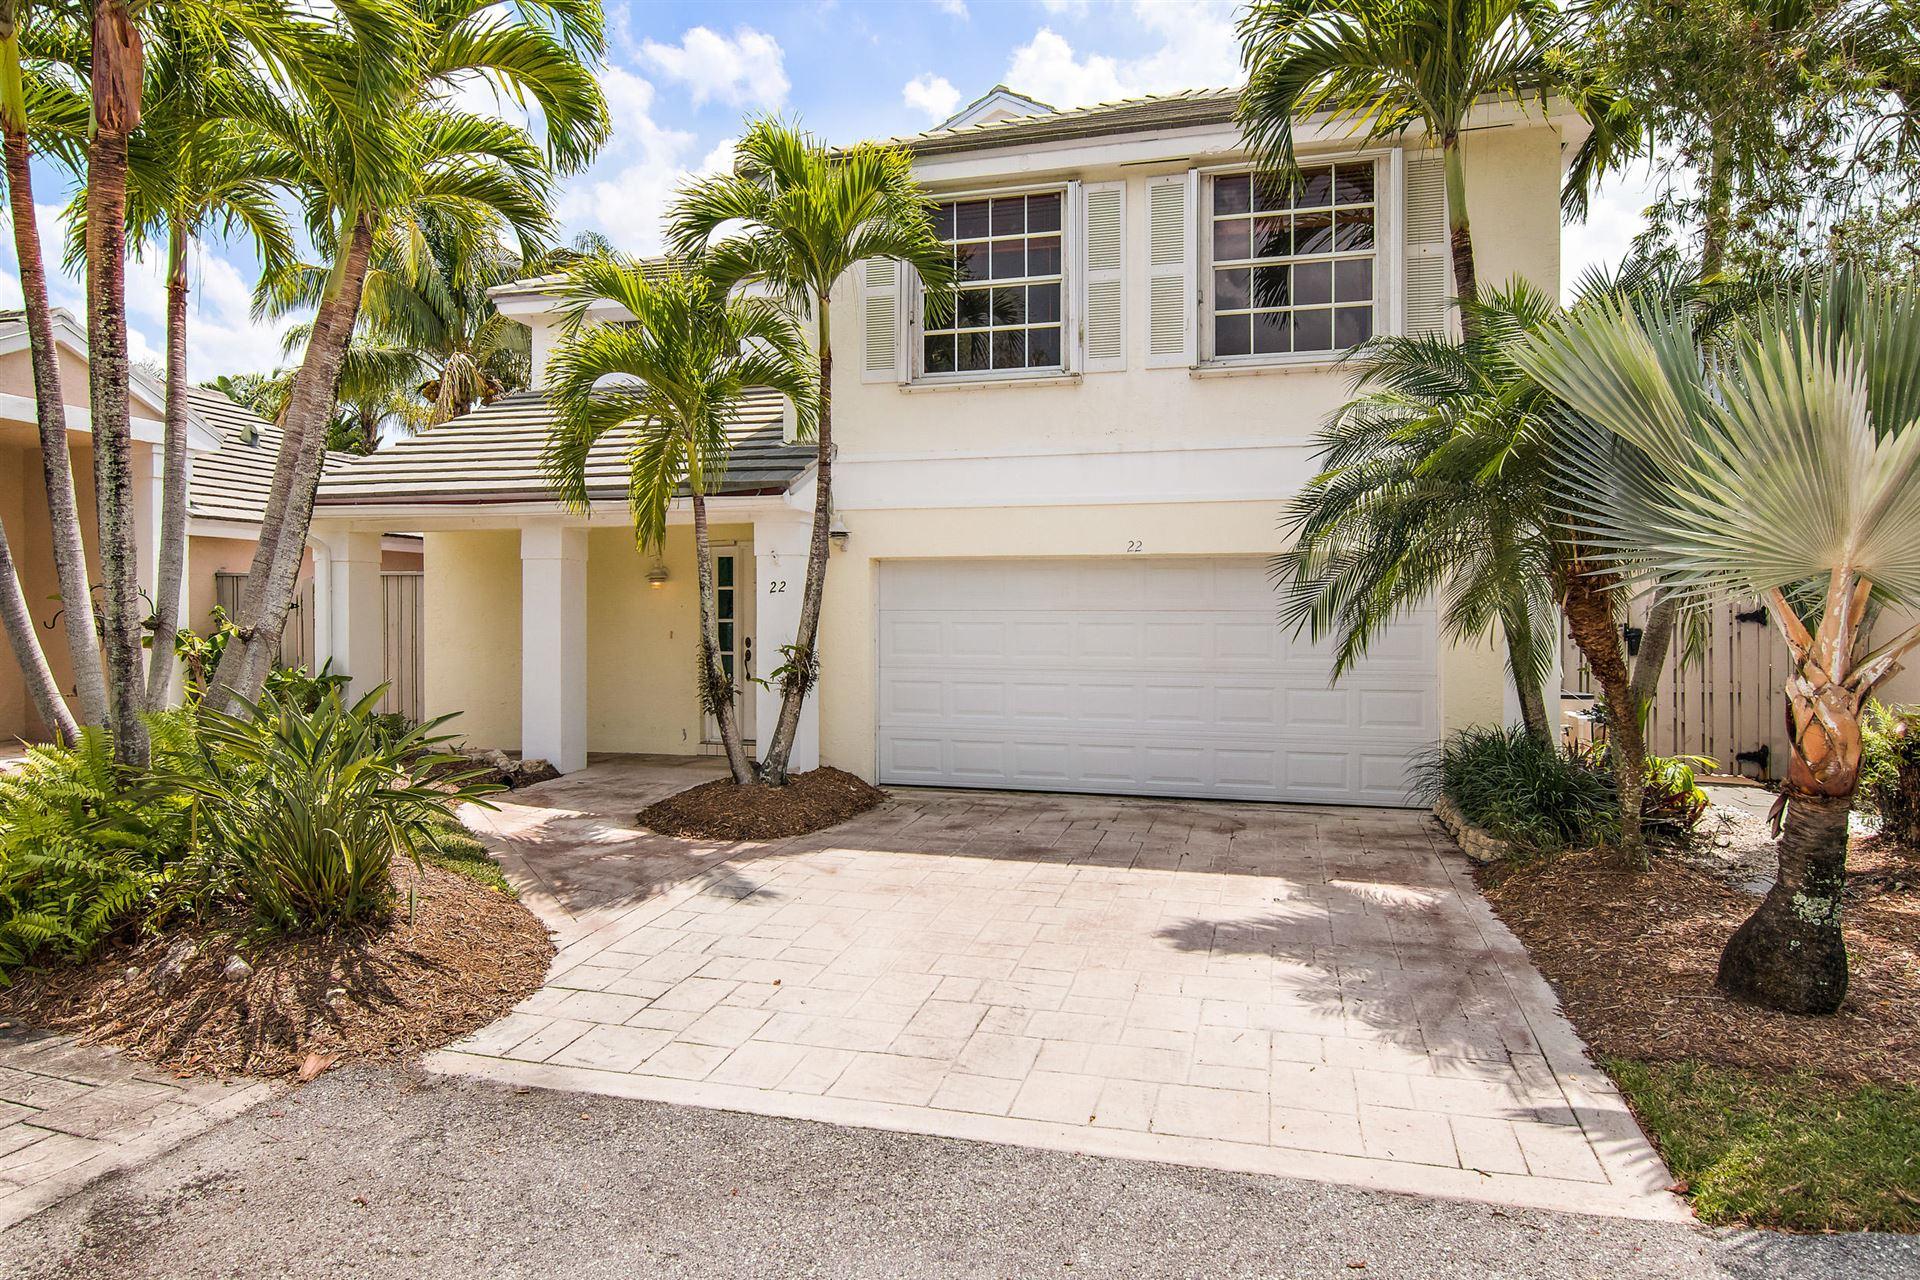 22 Governors Court, Palm Beach Gardens, FL 33418 - MLS#: RX-10700928